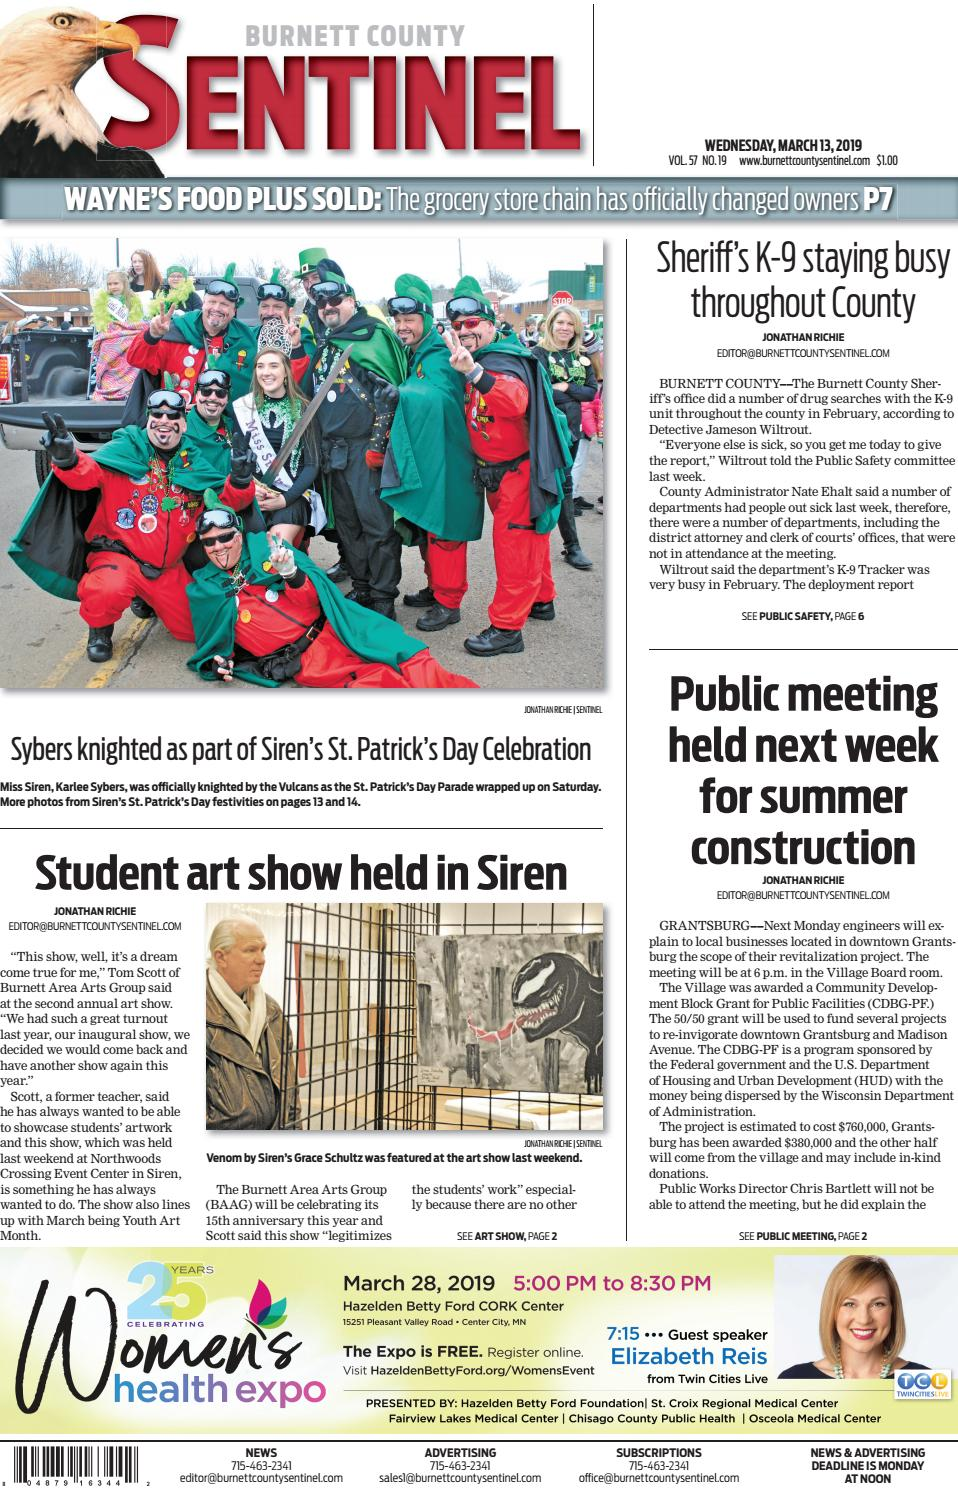 The Burnett County Sentinel 3-13-2019 by Burnett County Sentinel - issuu